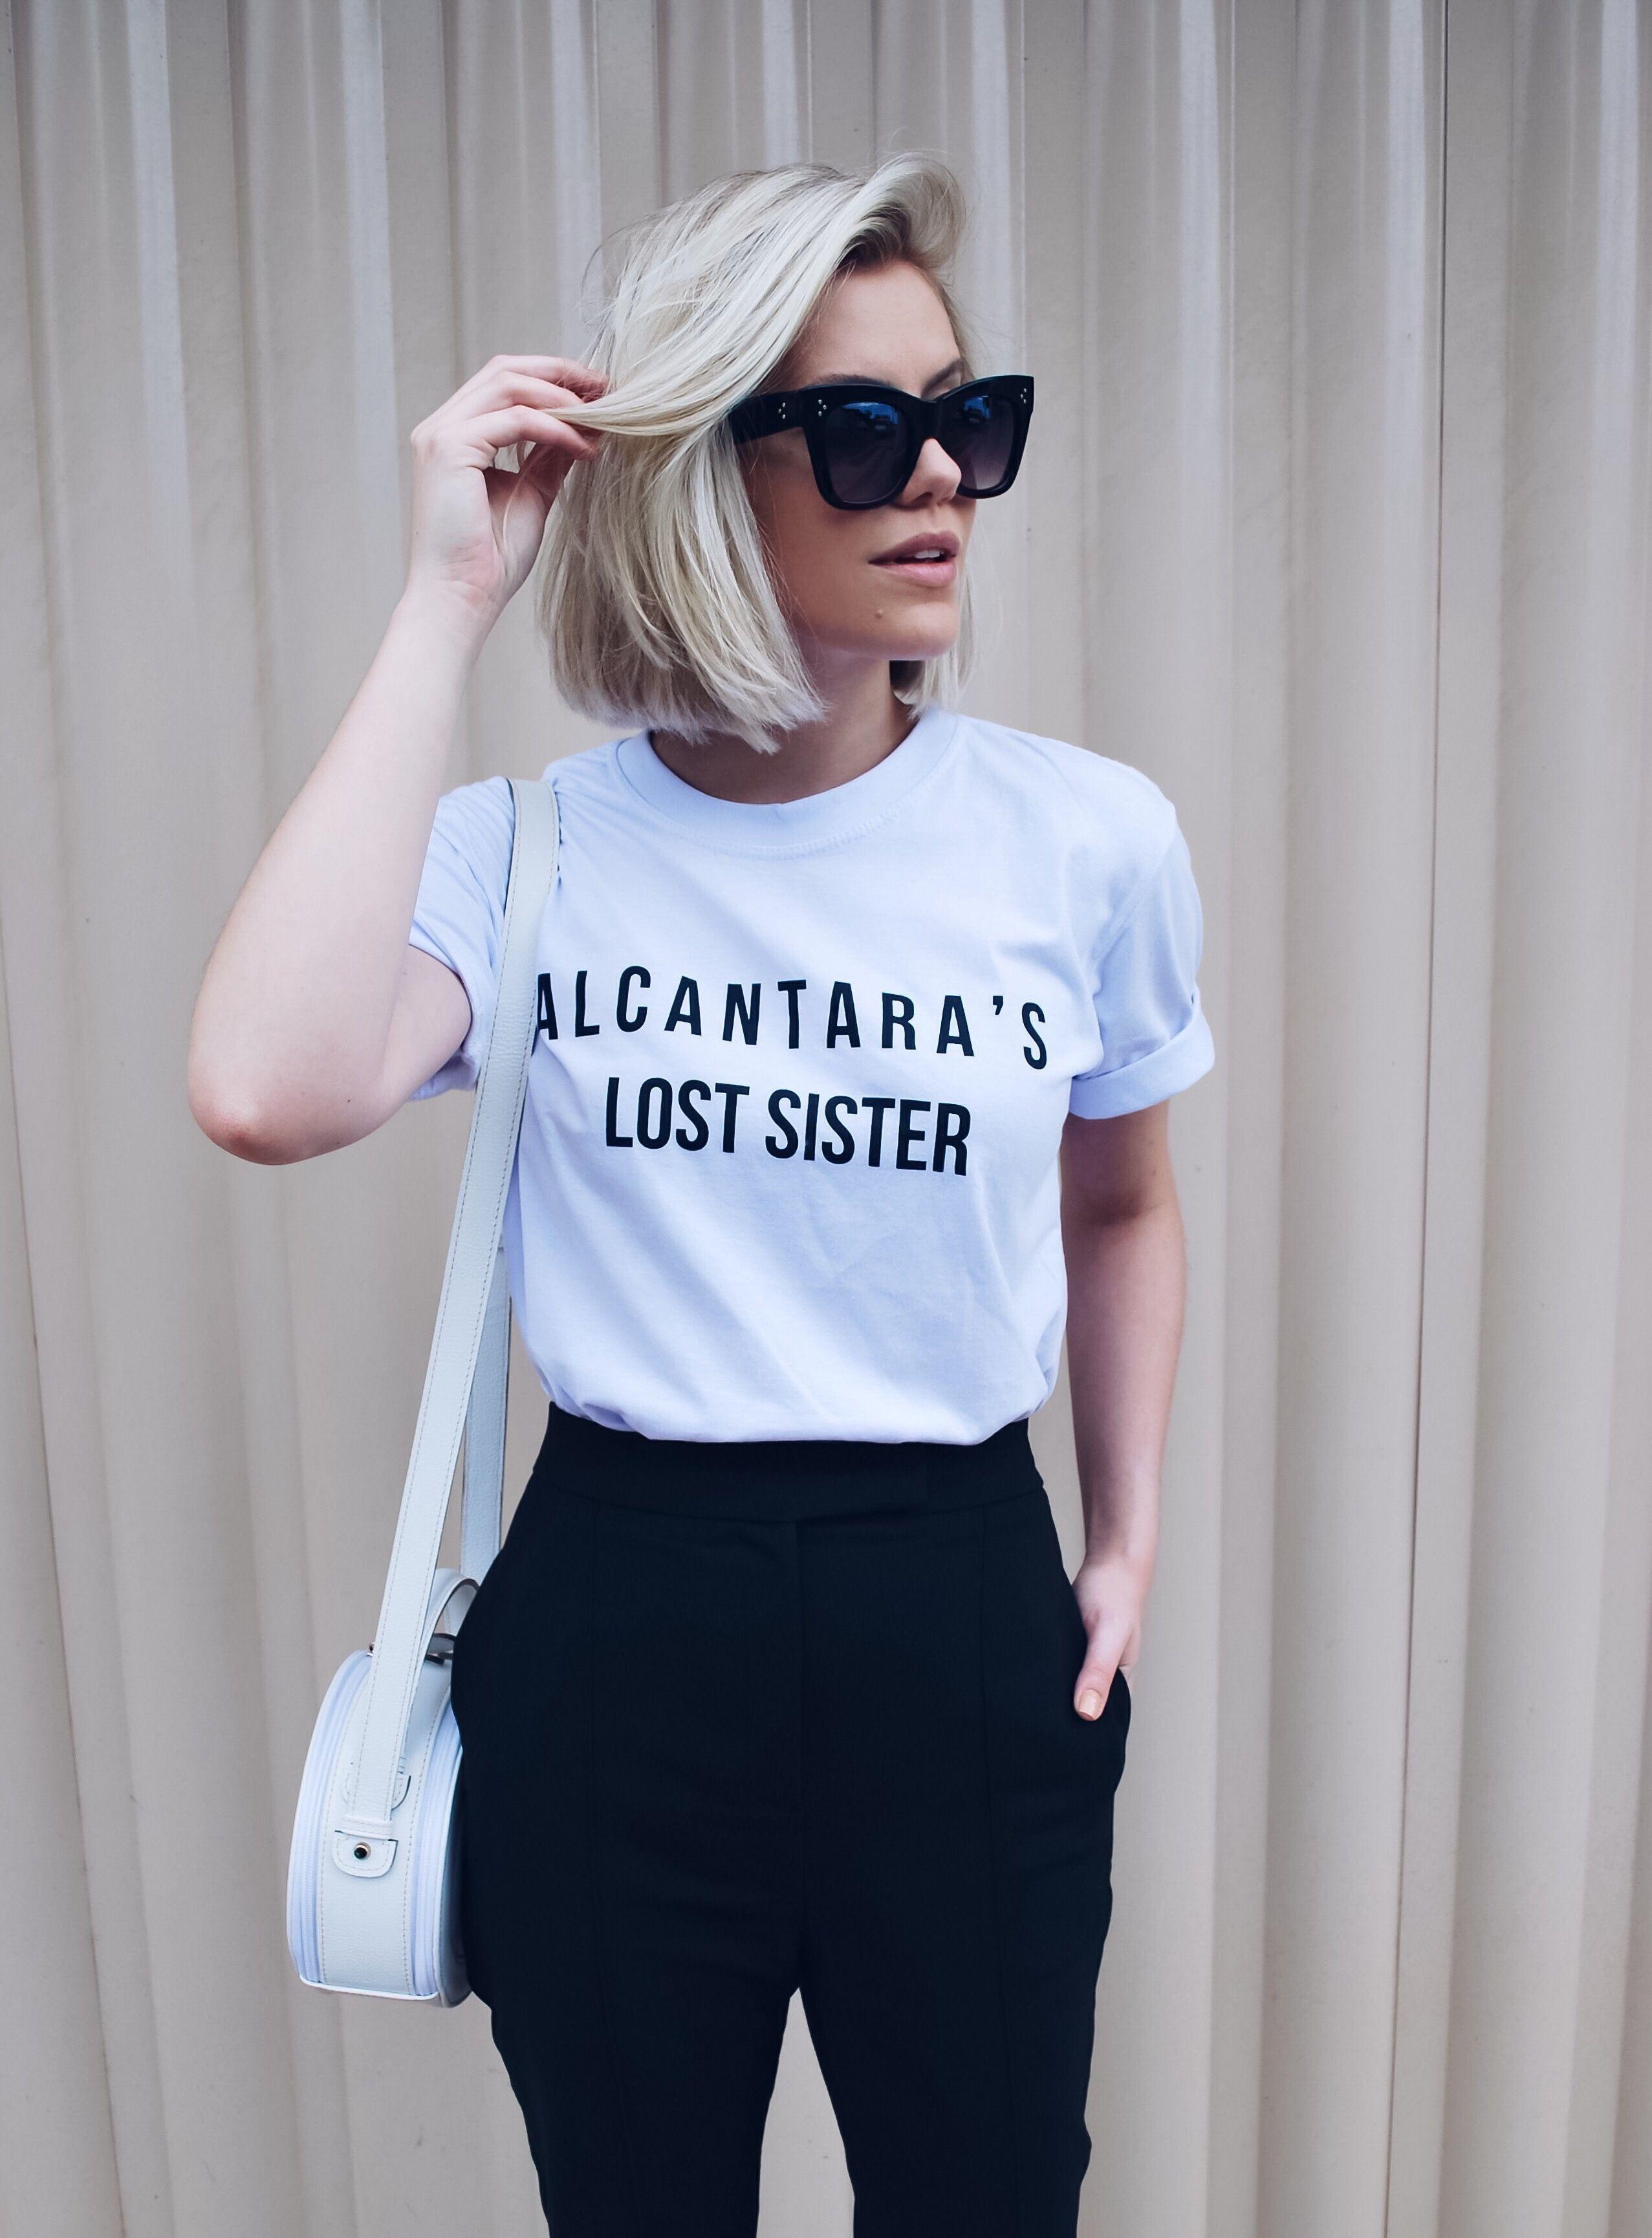 Black t shirt outfit tumblr - T Shirt Branca Cal A Preta Minimalismo